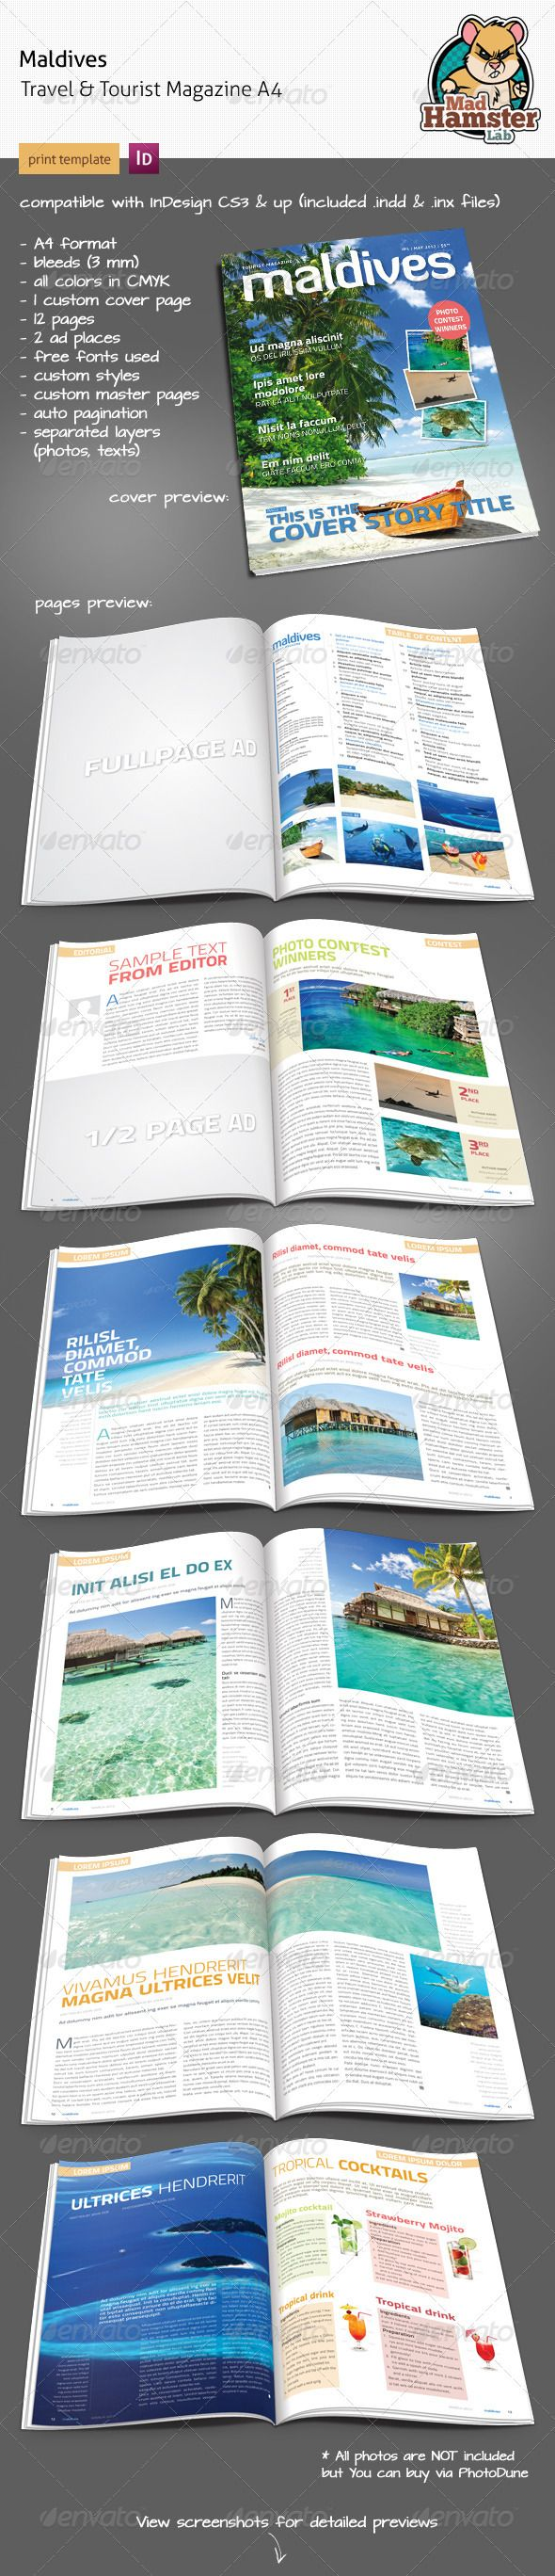 Maldives Tourist & Travel Magazine A4 | Travel magazines, Template ...